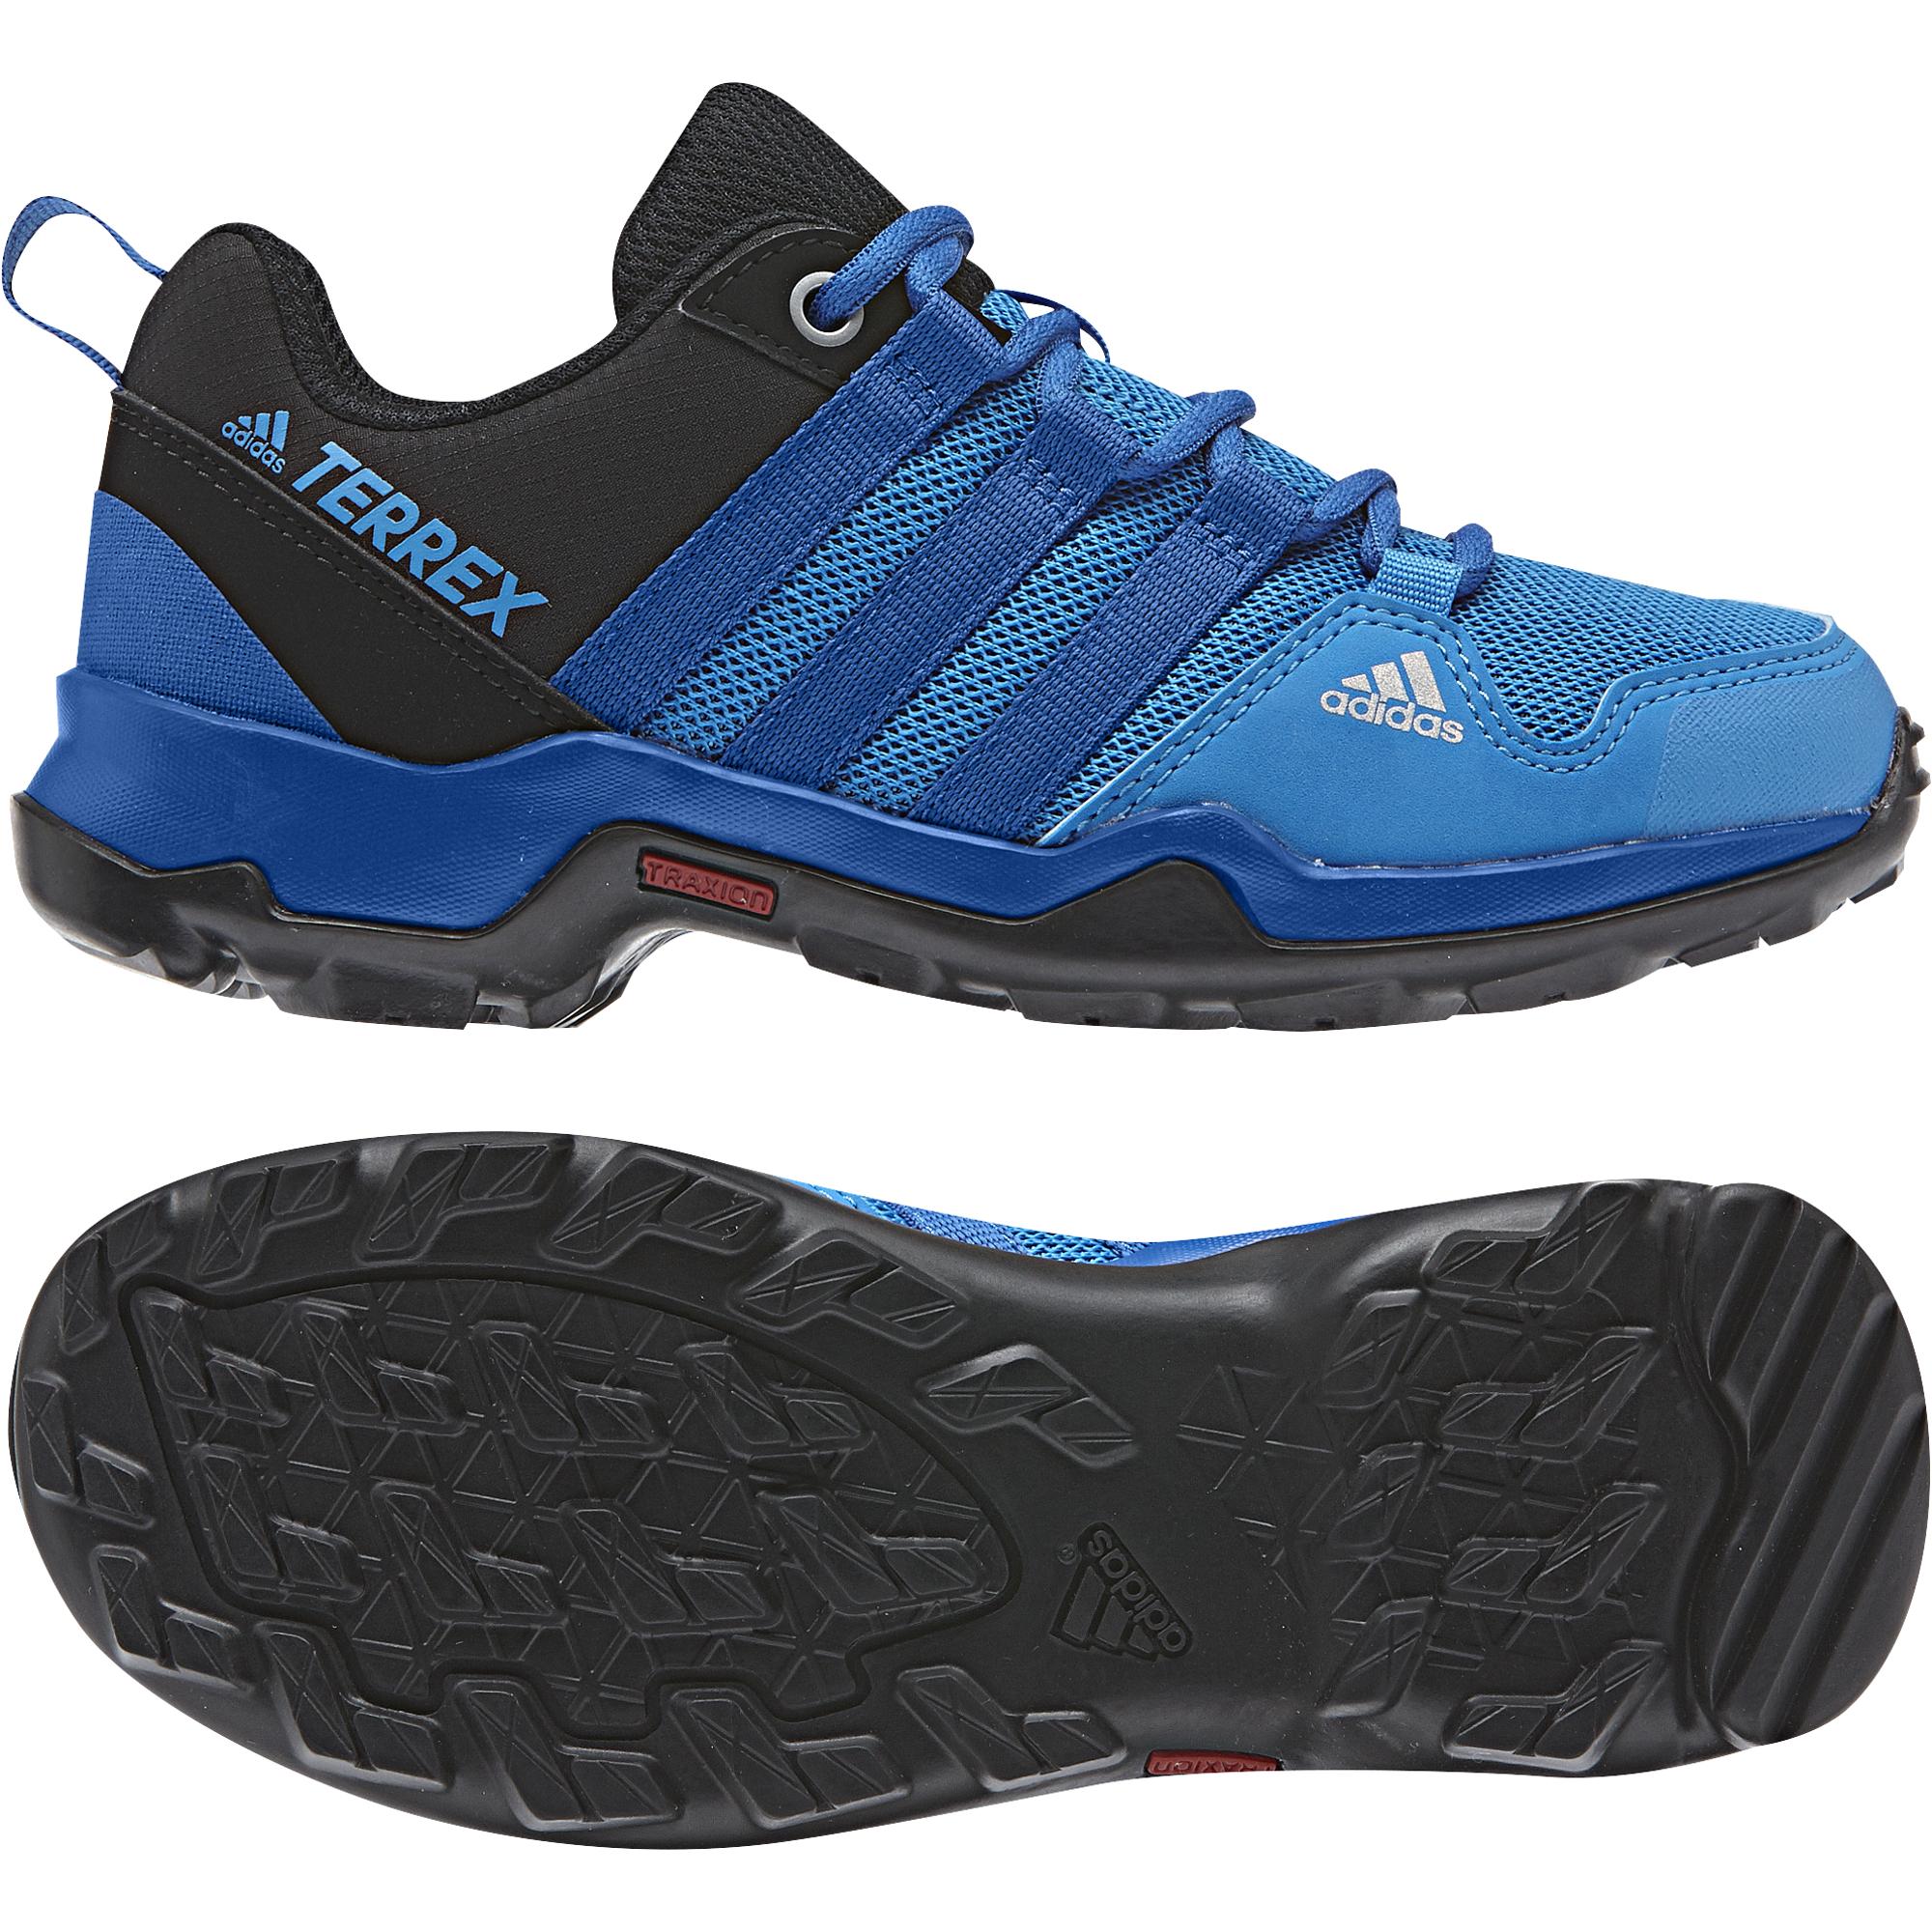 Topánky TERREX AX2R K adidas modré 5c148617a20